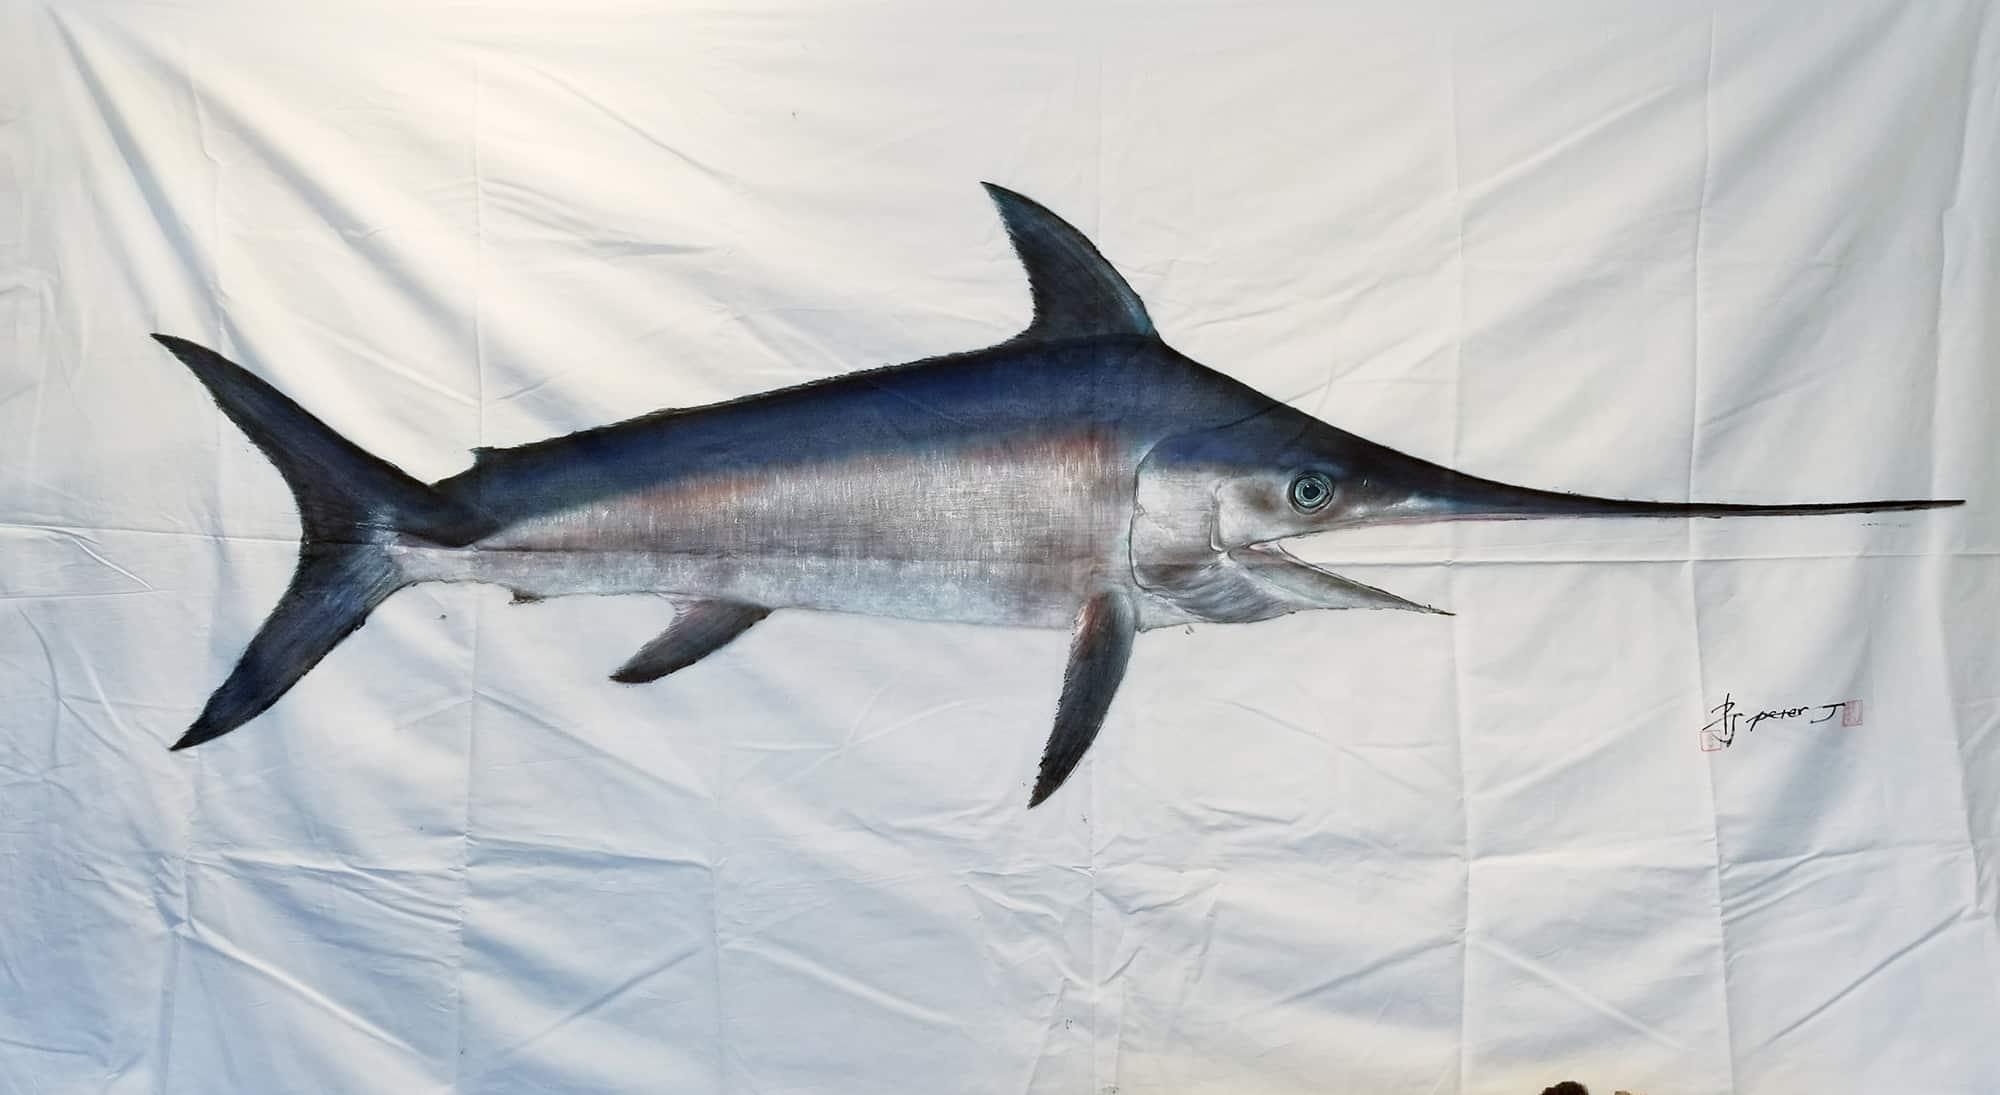 Peter J Art swordfish print